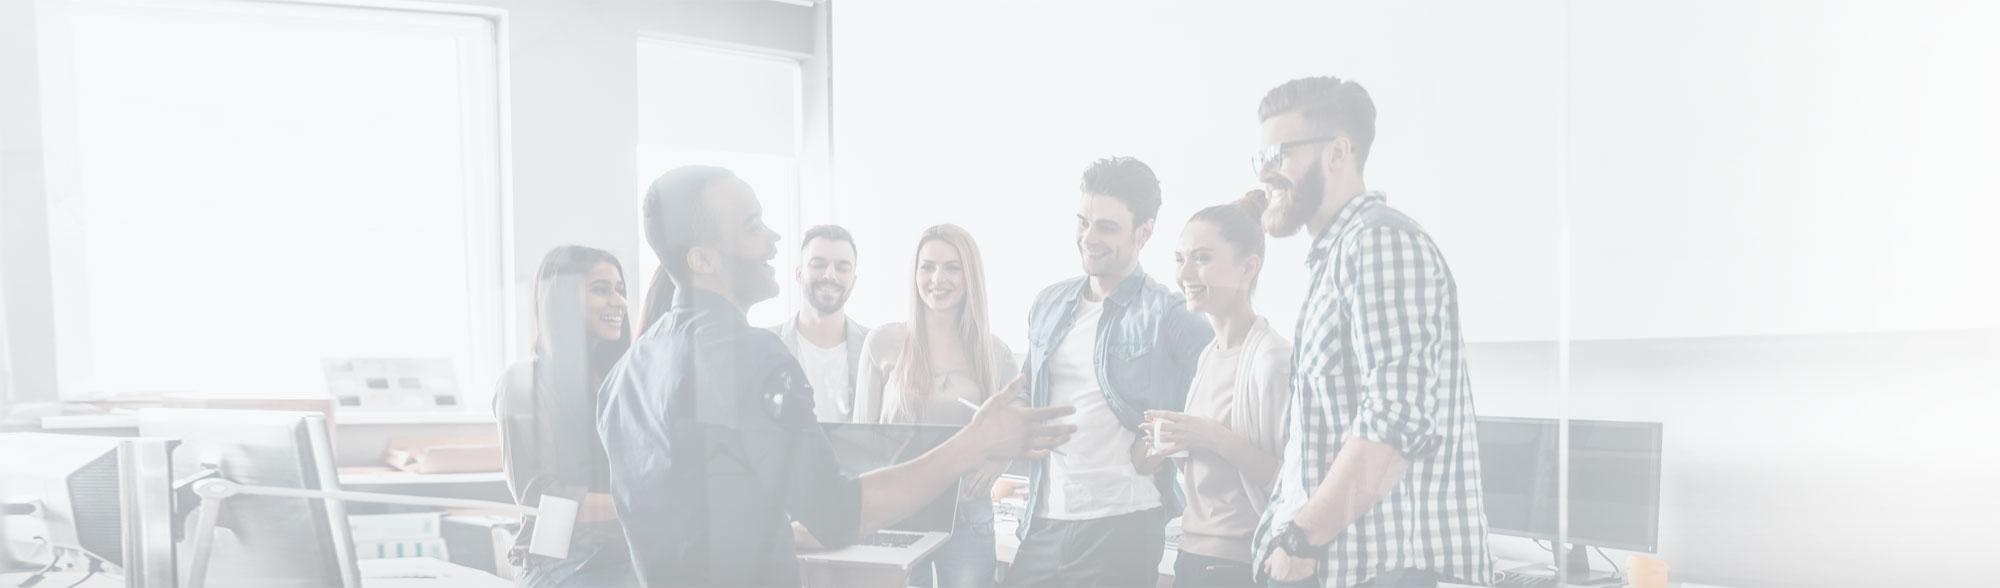 MindLabs career , Mindlabs systems Job Openings, Web Designer job Openings Kochi